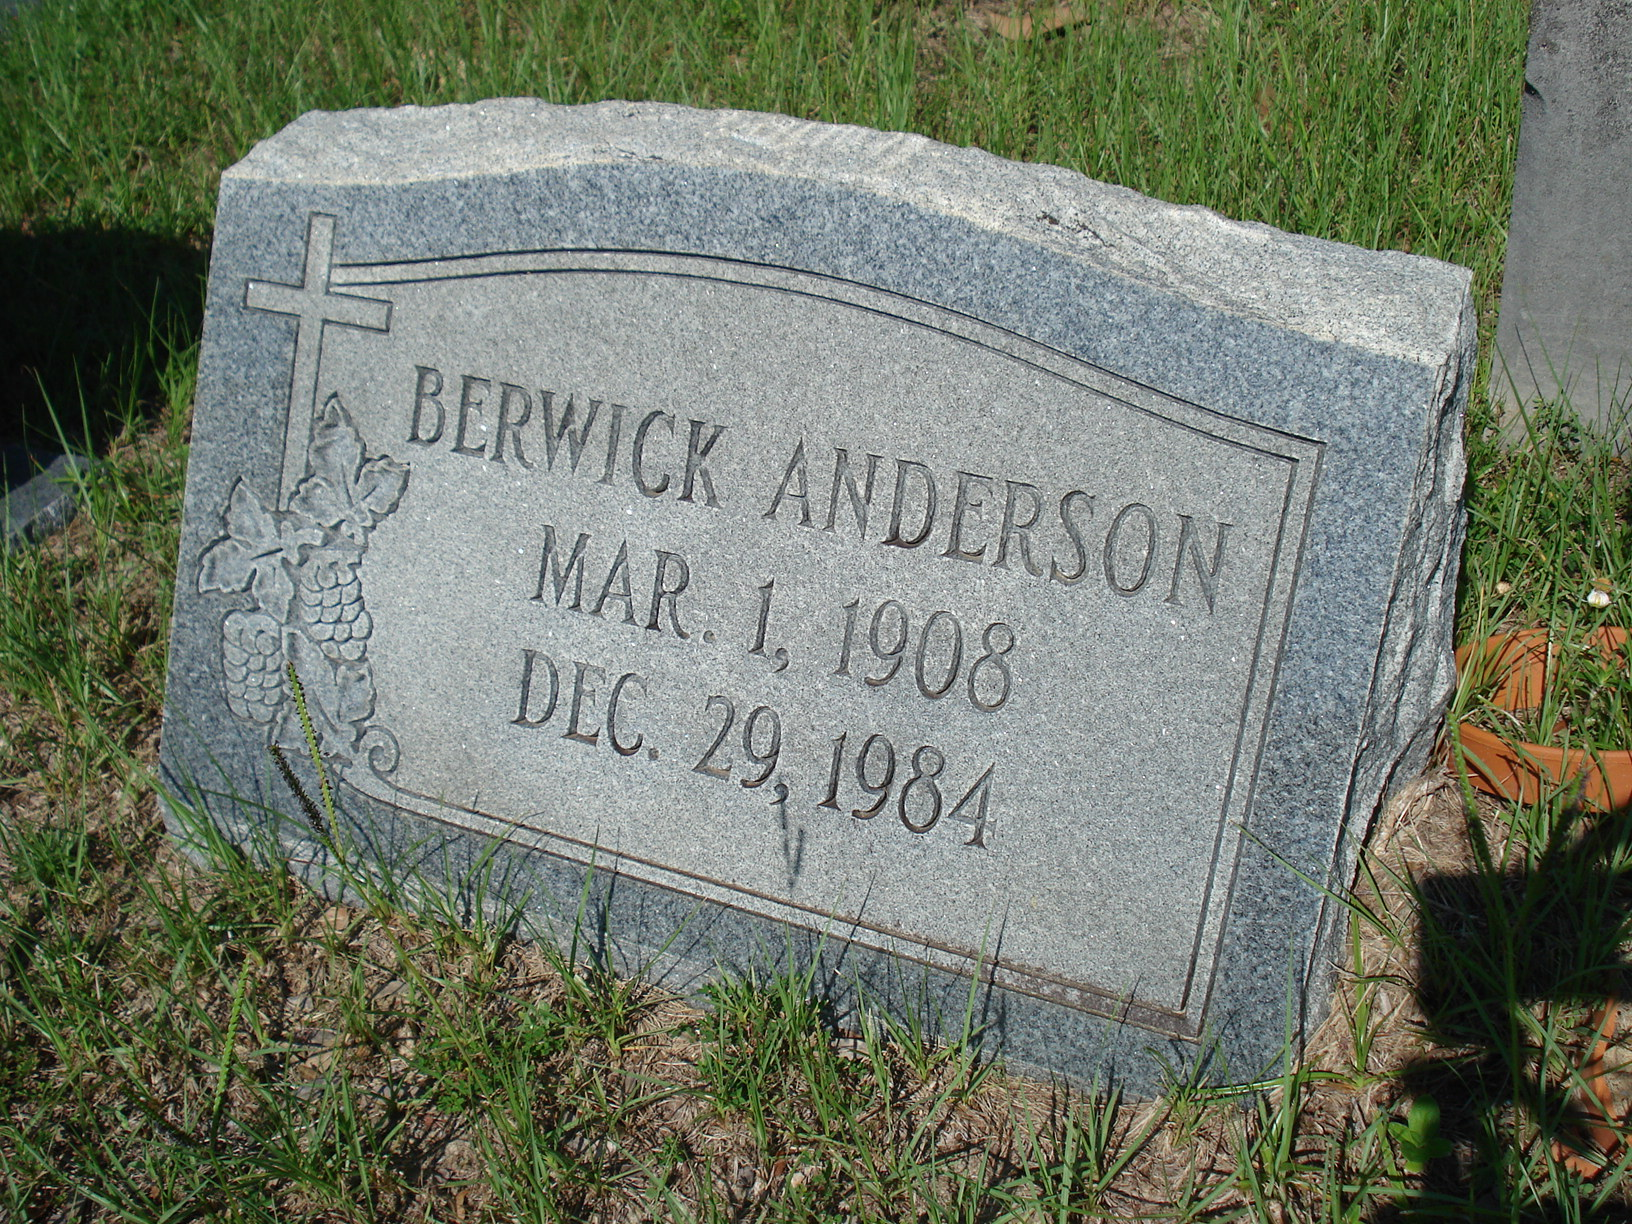 Berwick Anderson